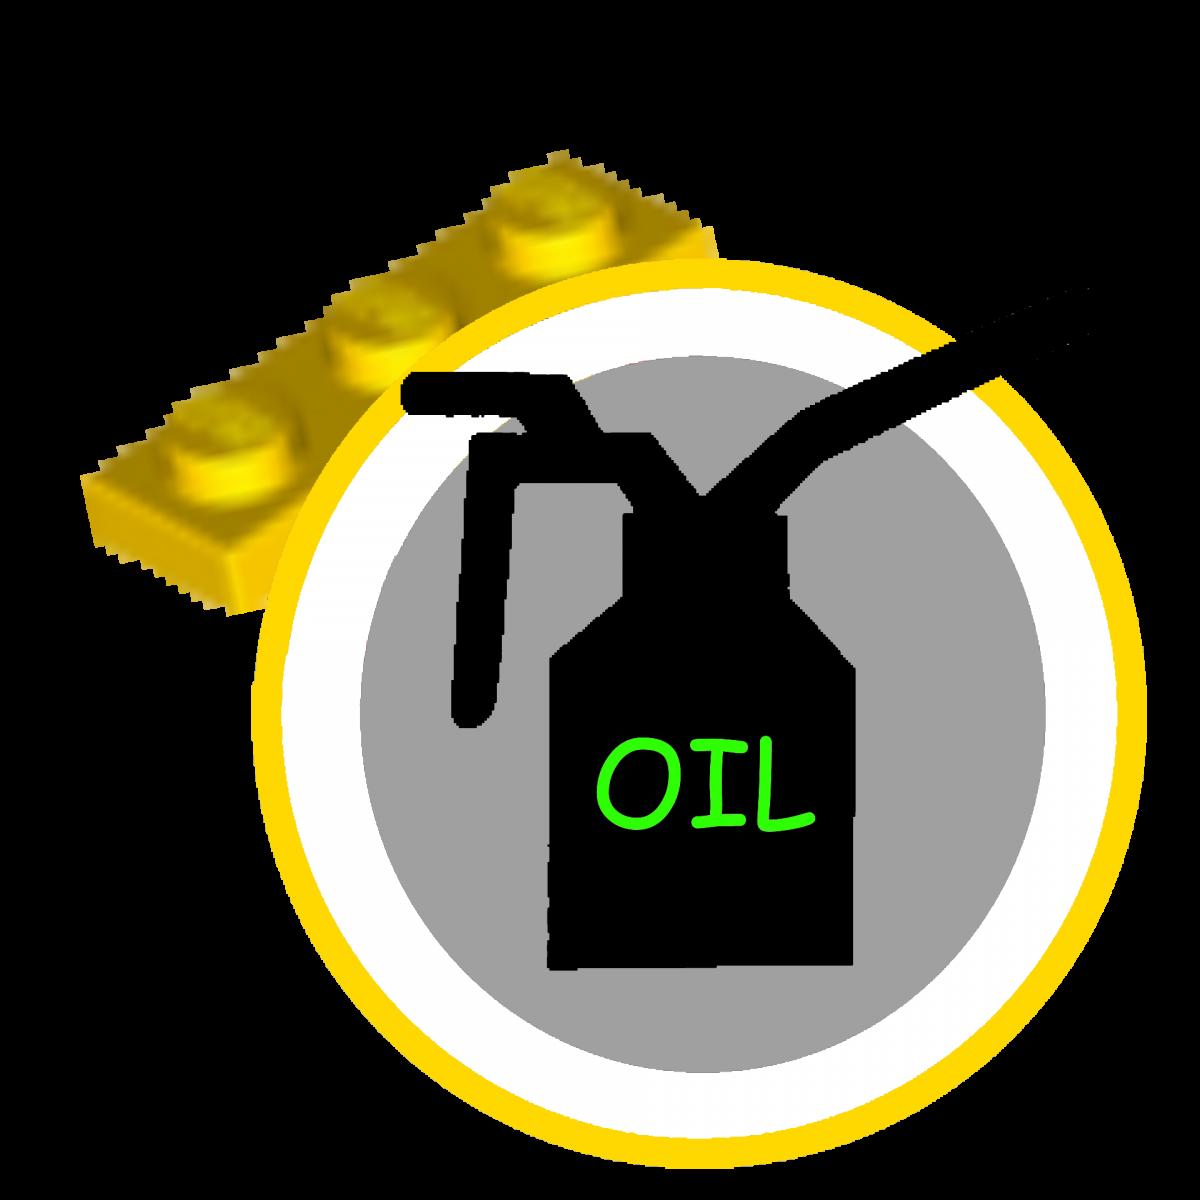 large.oilcan.png.91ac9a10d70b9631d67a1a2b3bd8b4ba.png